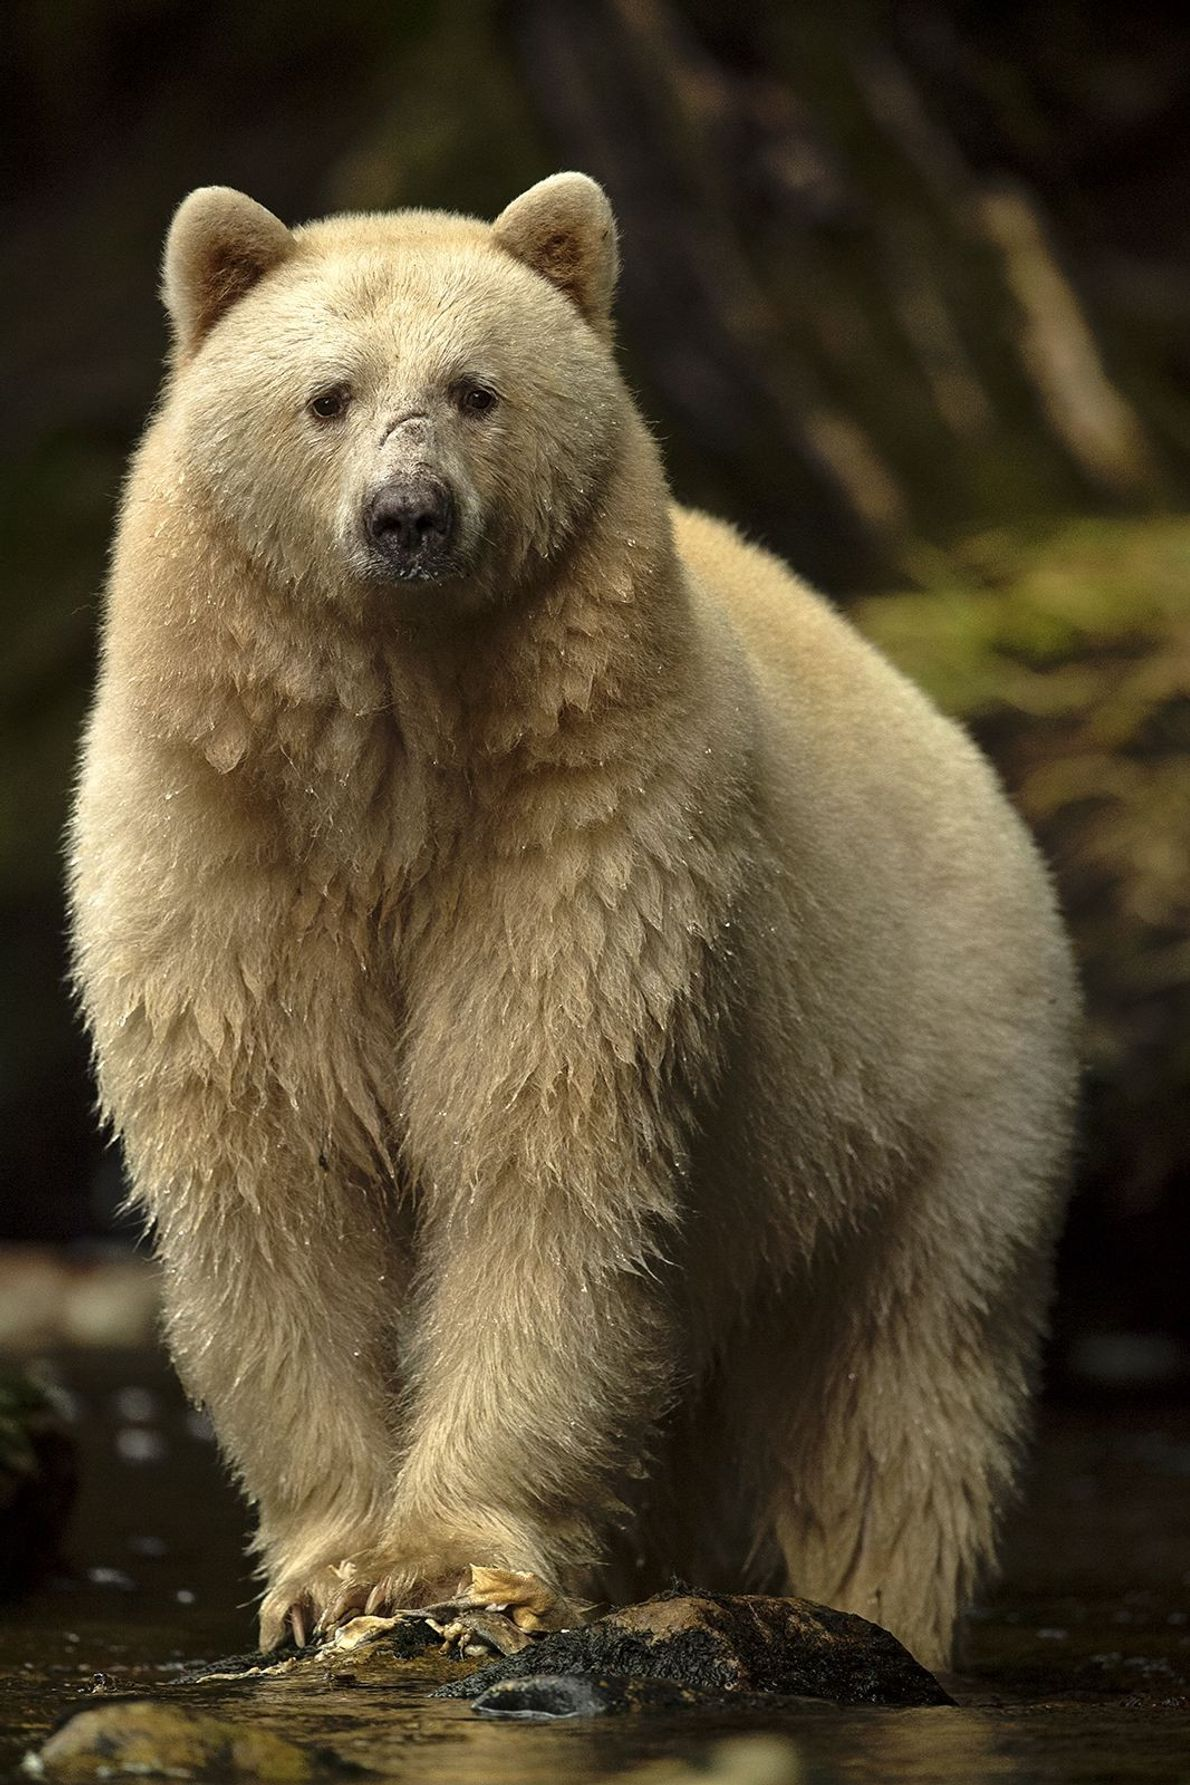 Great Bear Rainforest, British Columbia